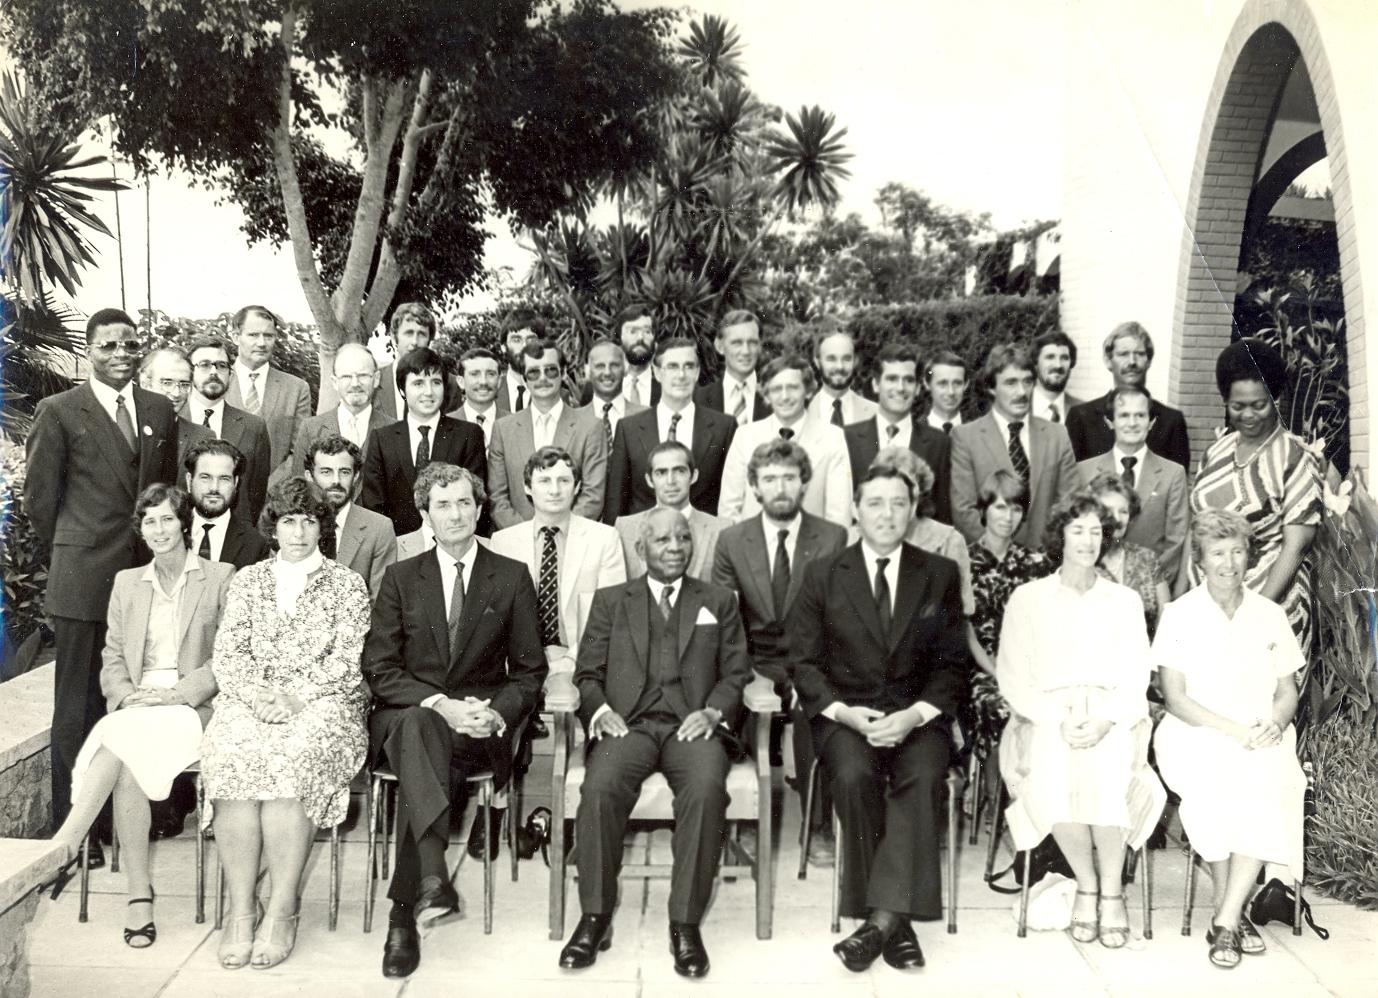 File:Dr Banda with staff for Kamuzu Academy.jpg - Wikimedia Commons